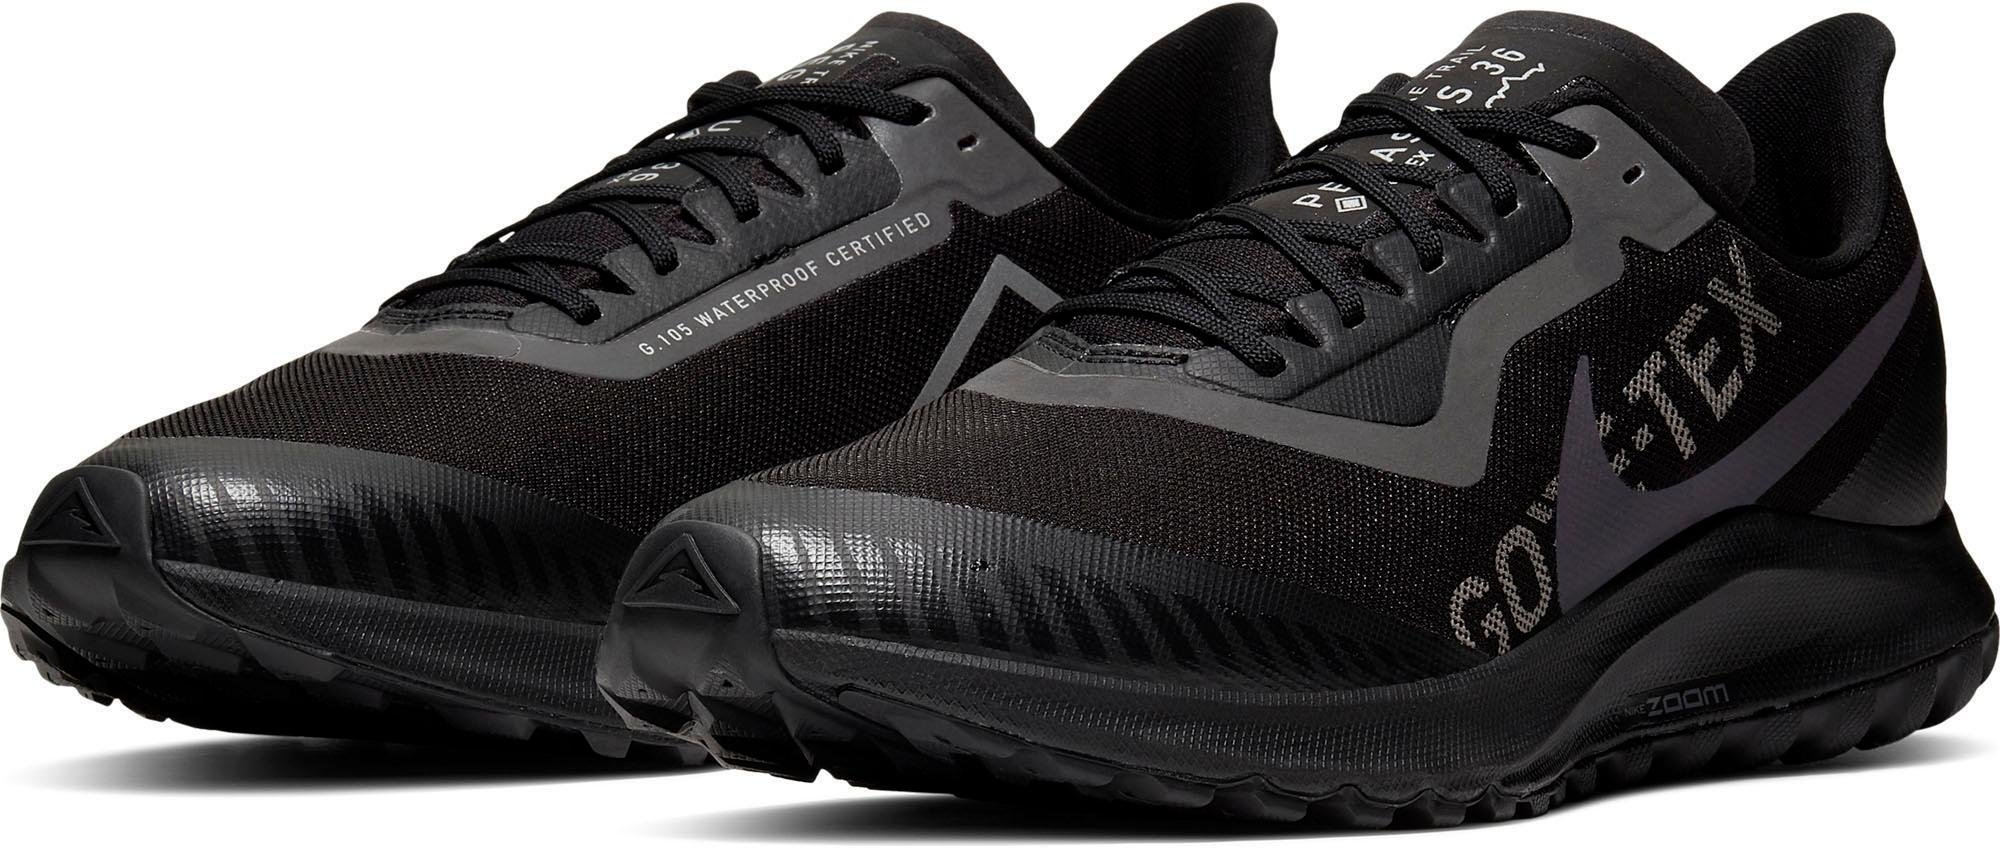 Nike runningschoenen »Pegasus 36 Trail Goretex« online kopen op otto.nl